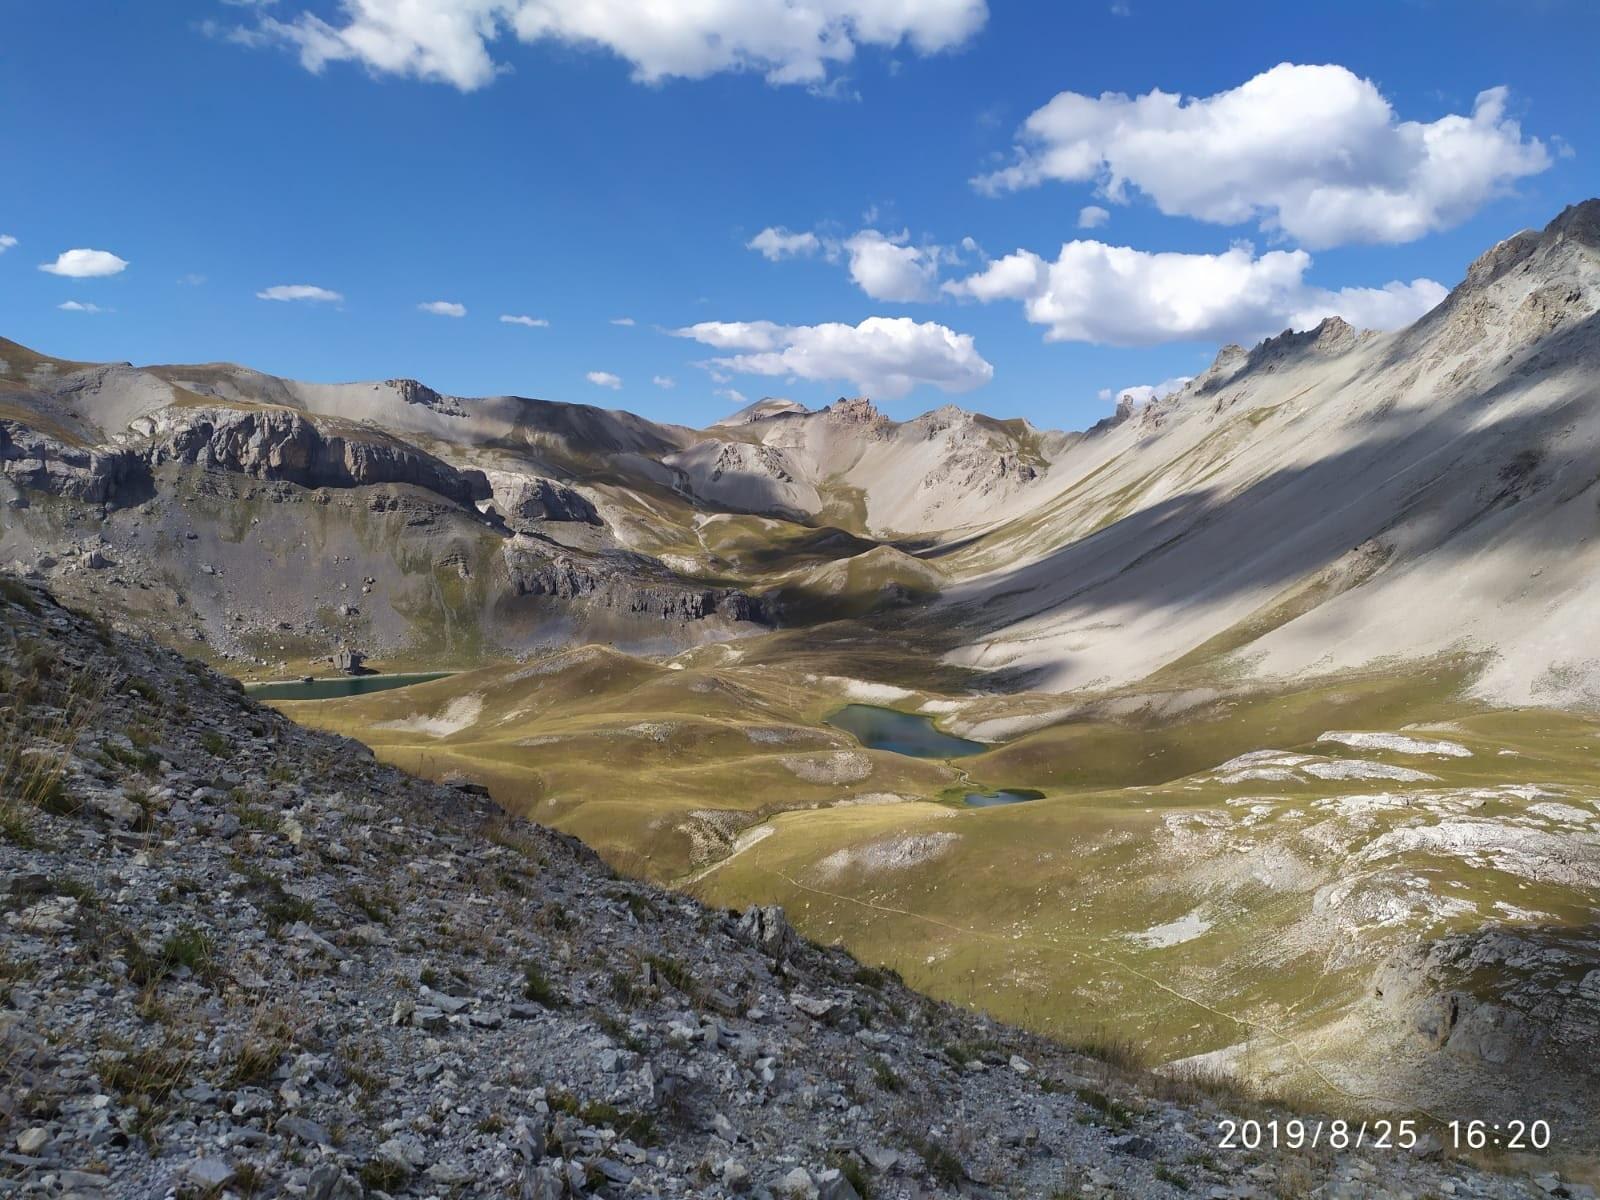 Lac de noel from Peyron pass